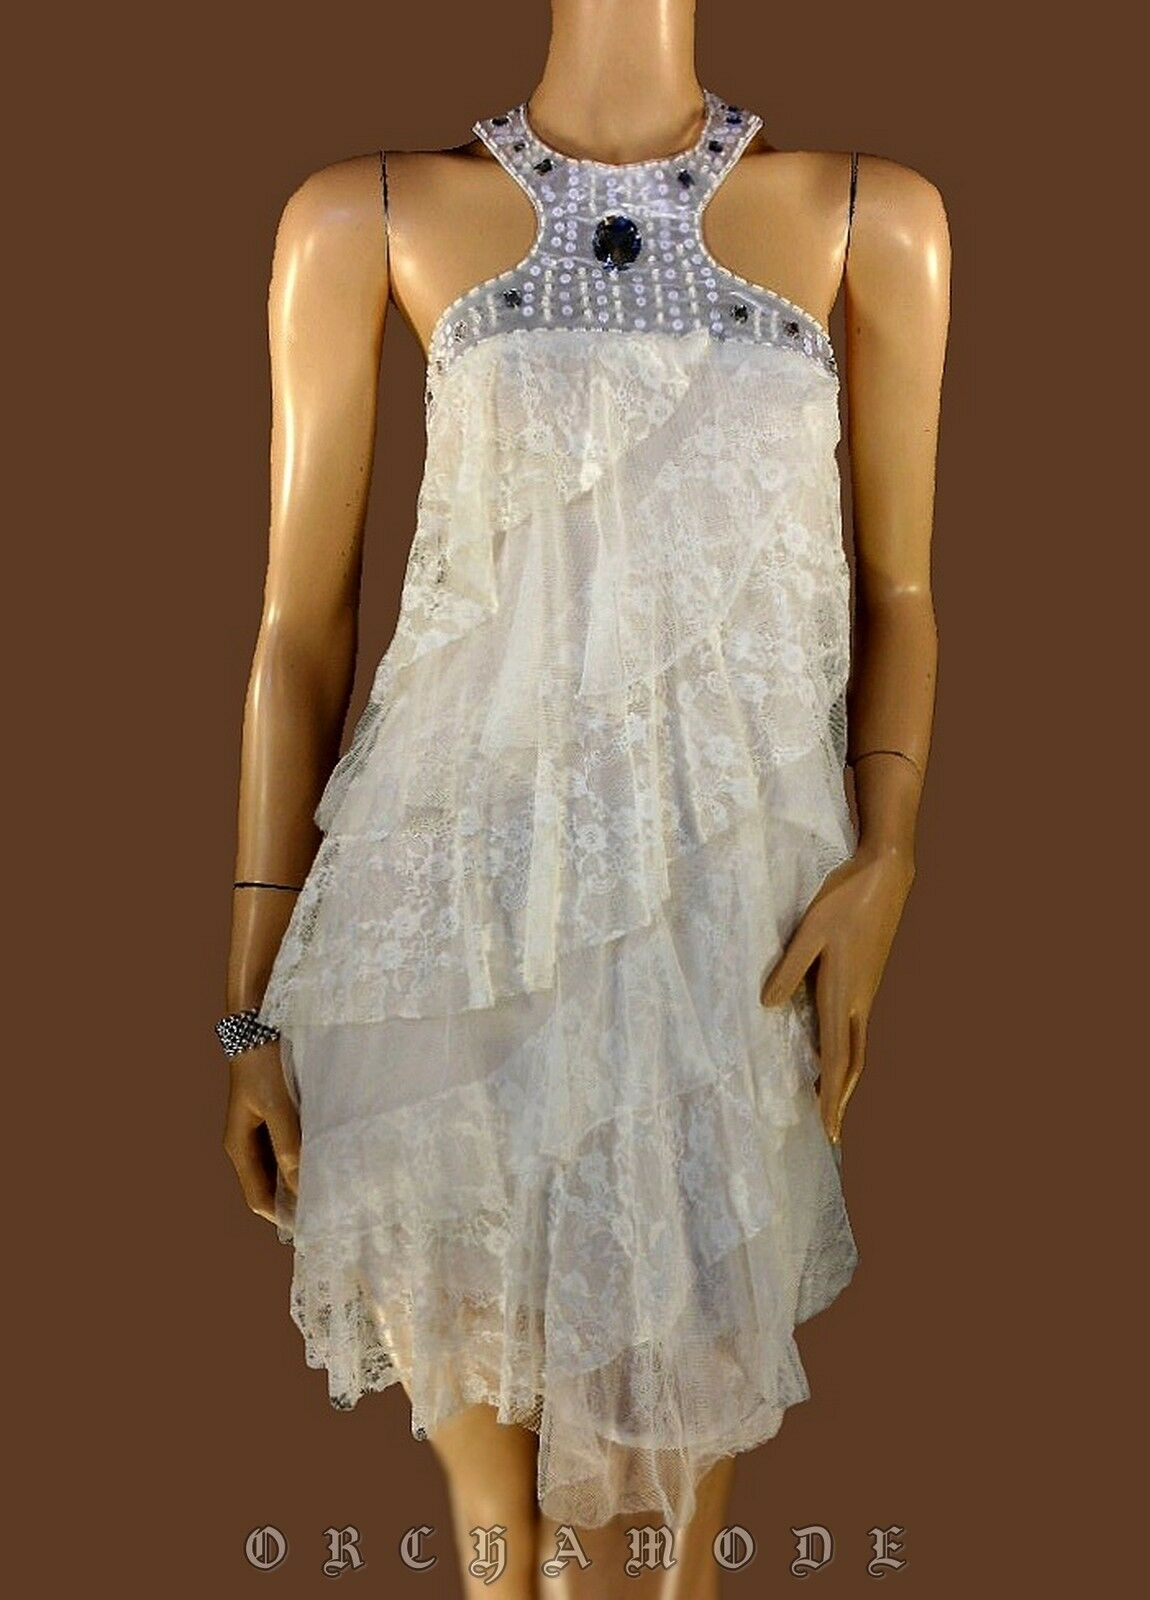 Robe S.C FASHION white Tail 40 L 3 Volant dentelle Soirée NEUF Tunique Dress